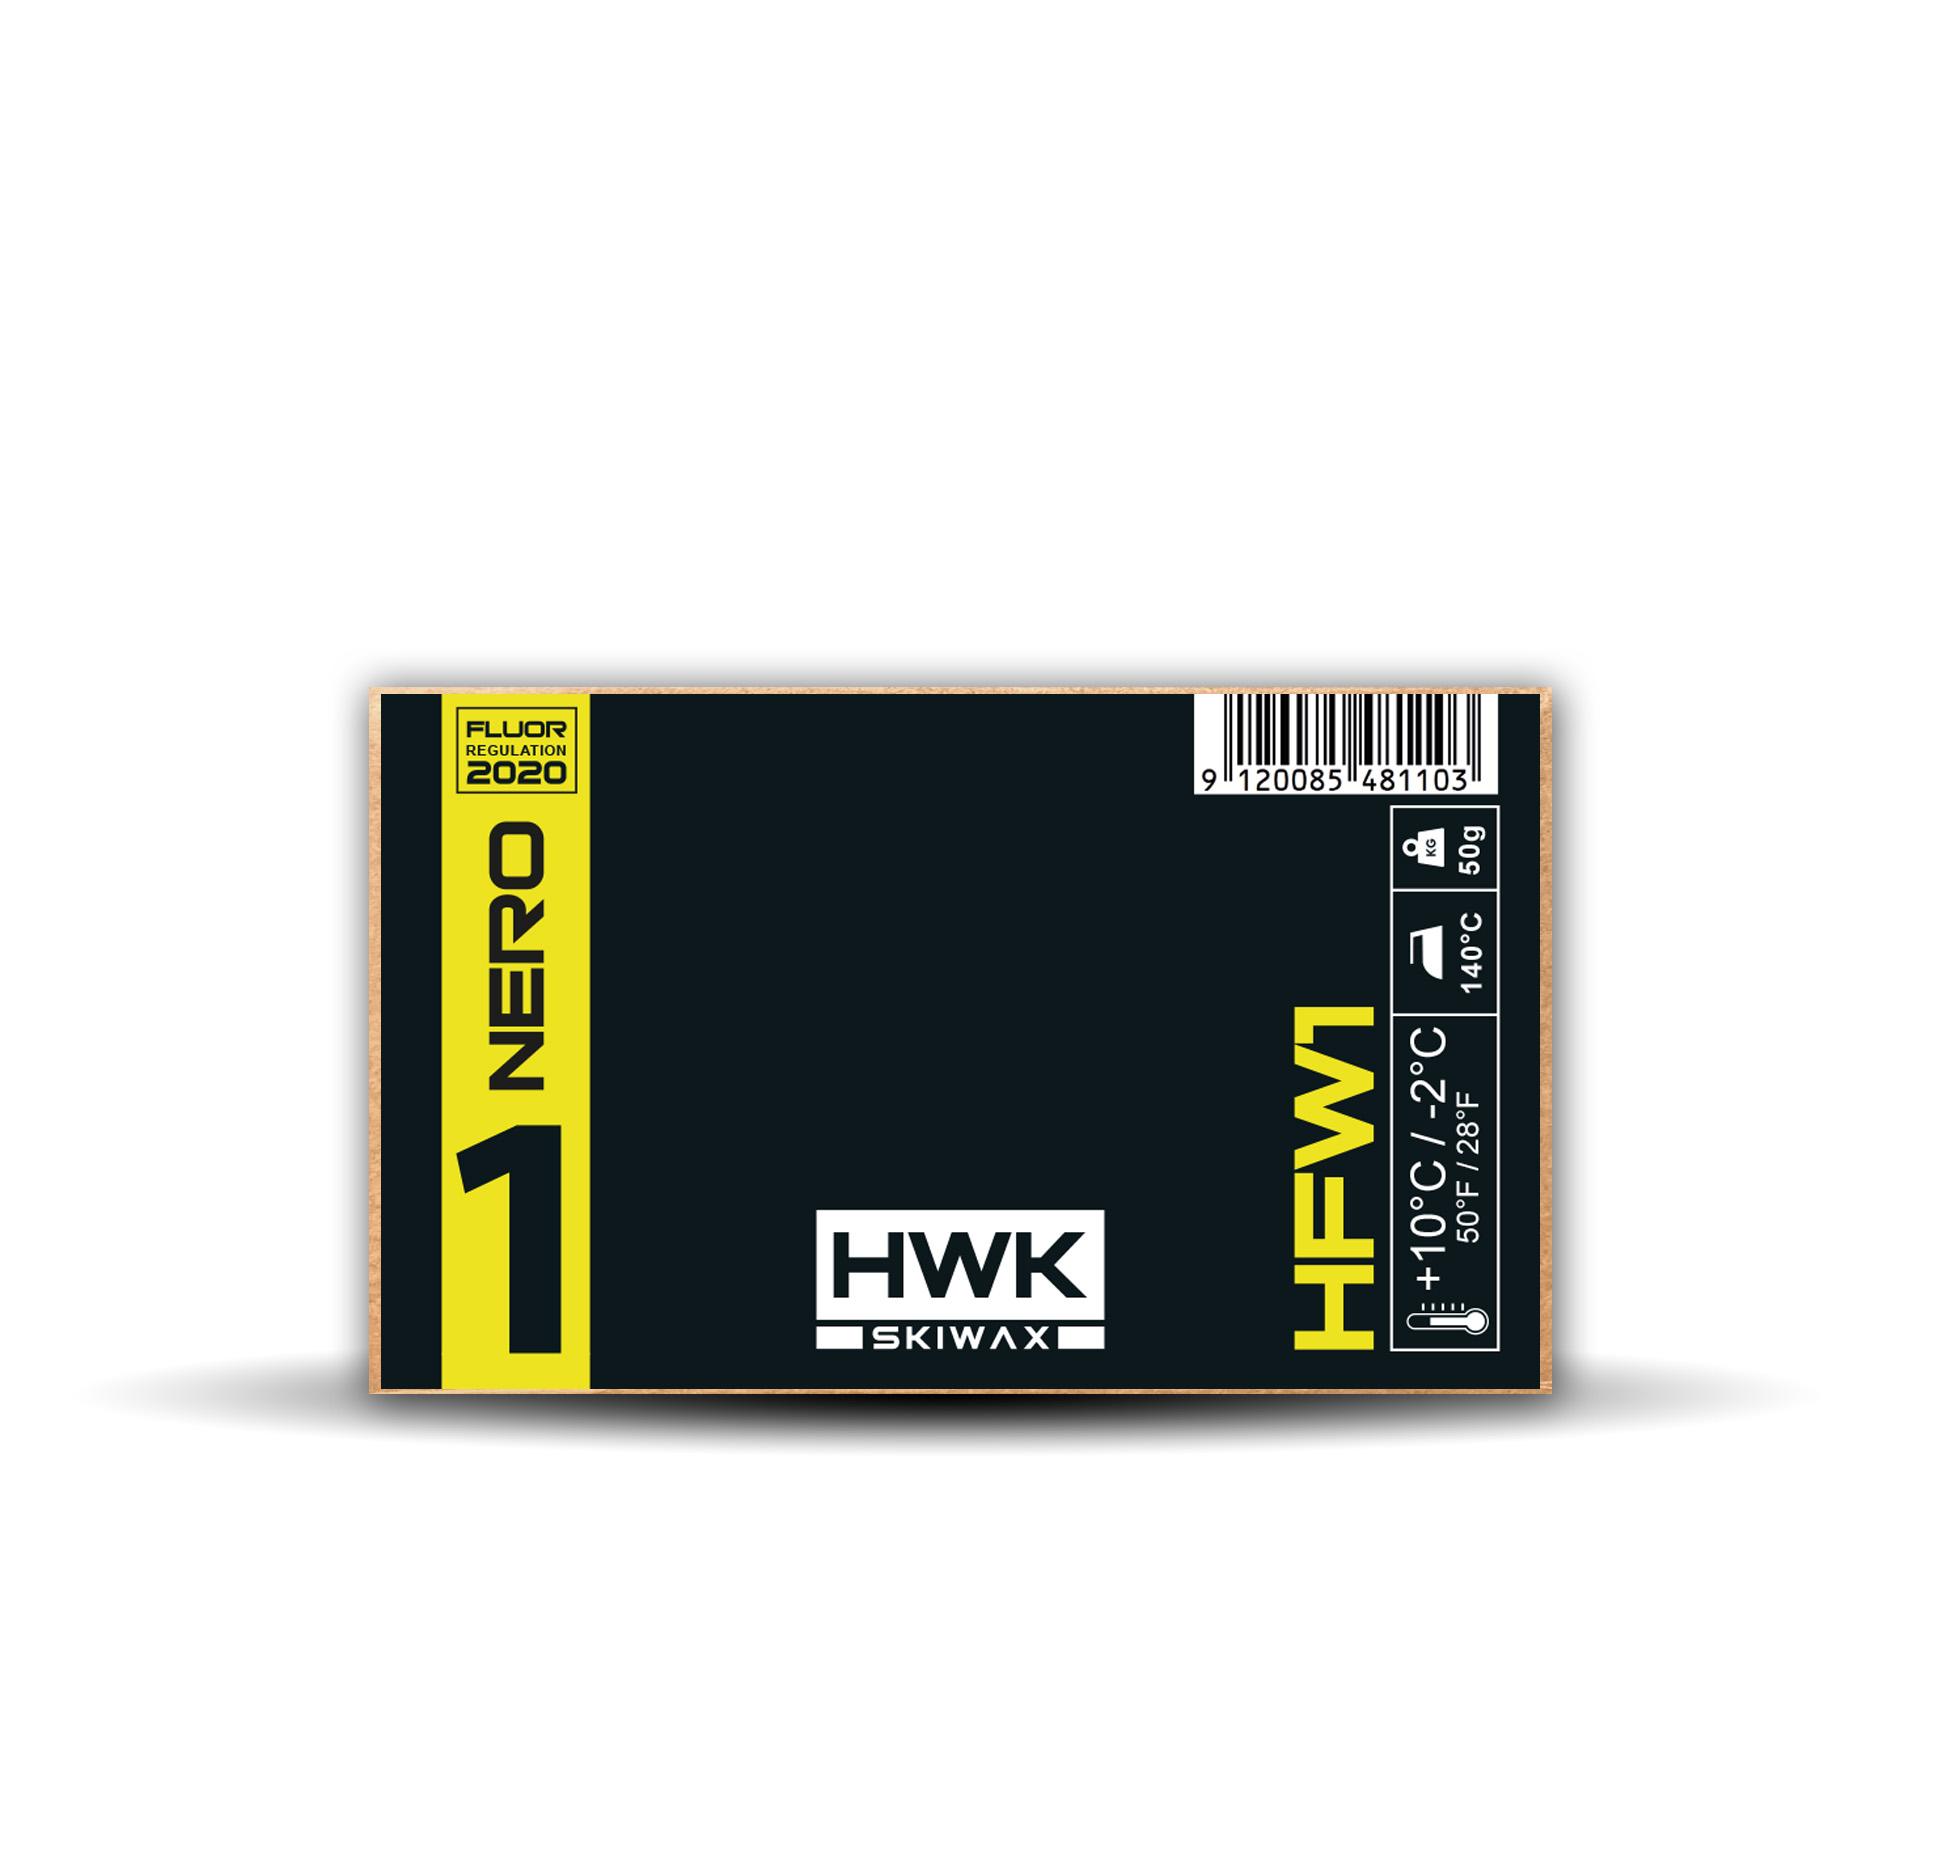 HWK HFW1 nero